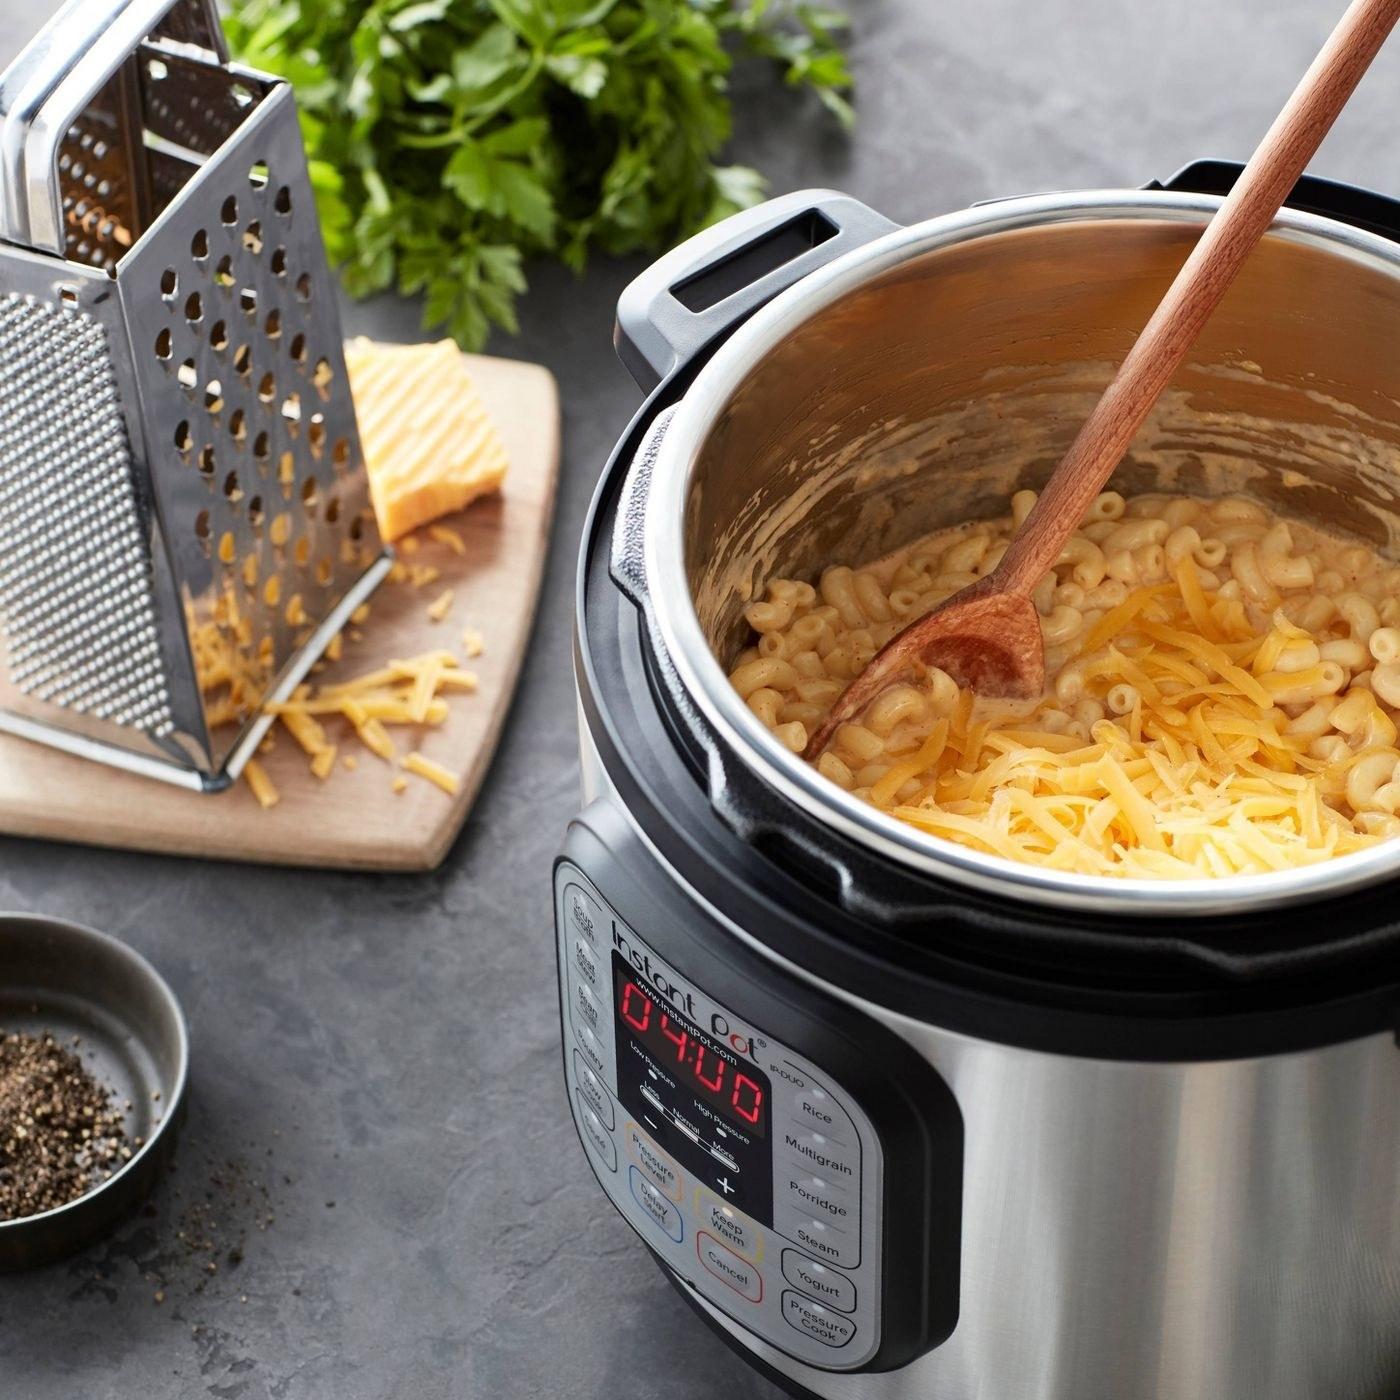 The pressure cooker